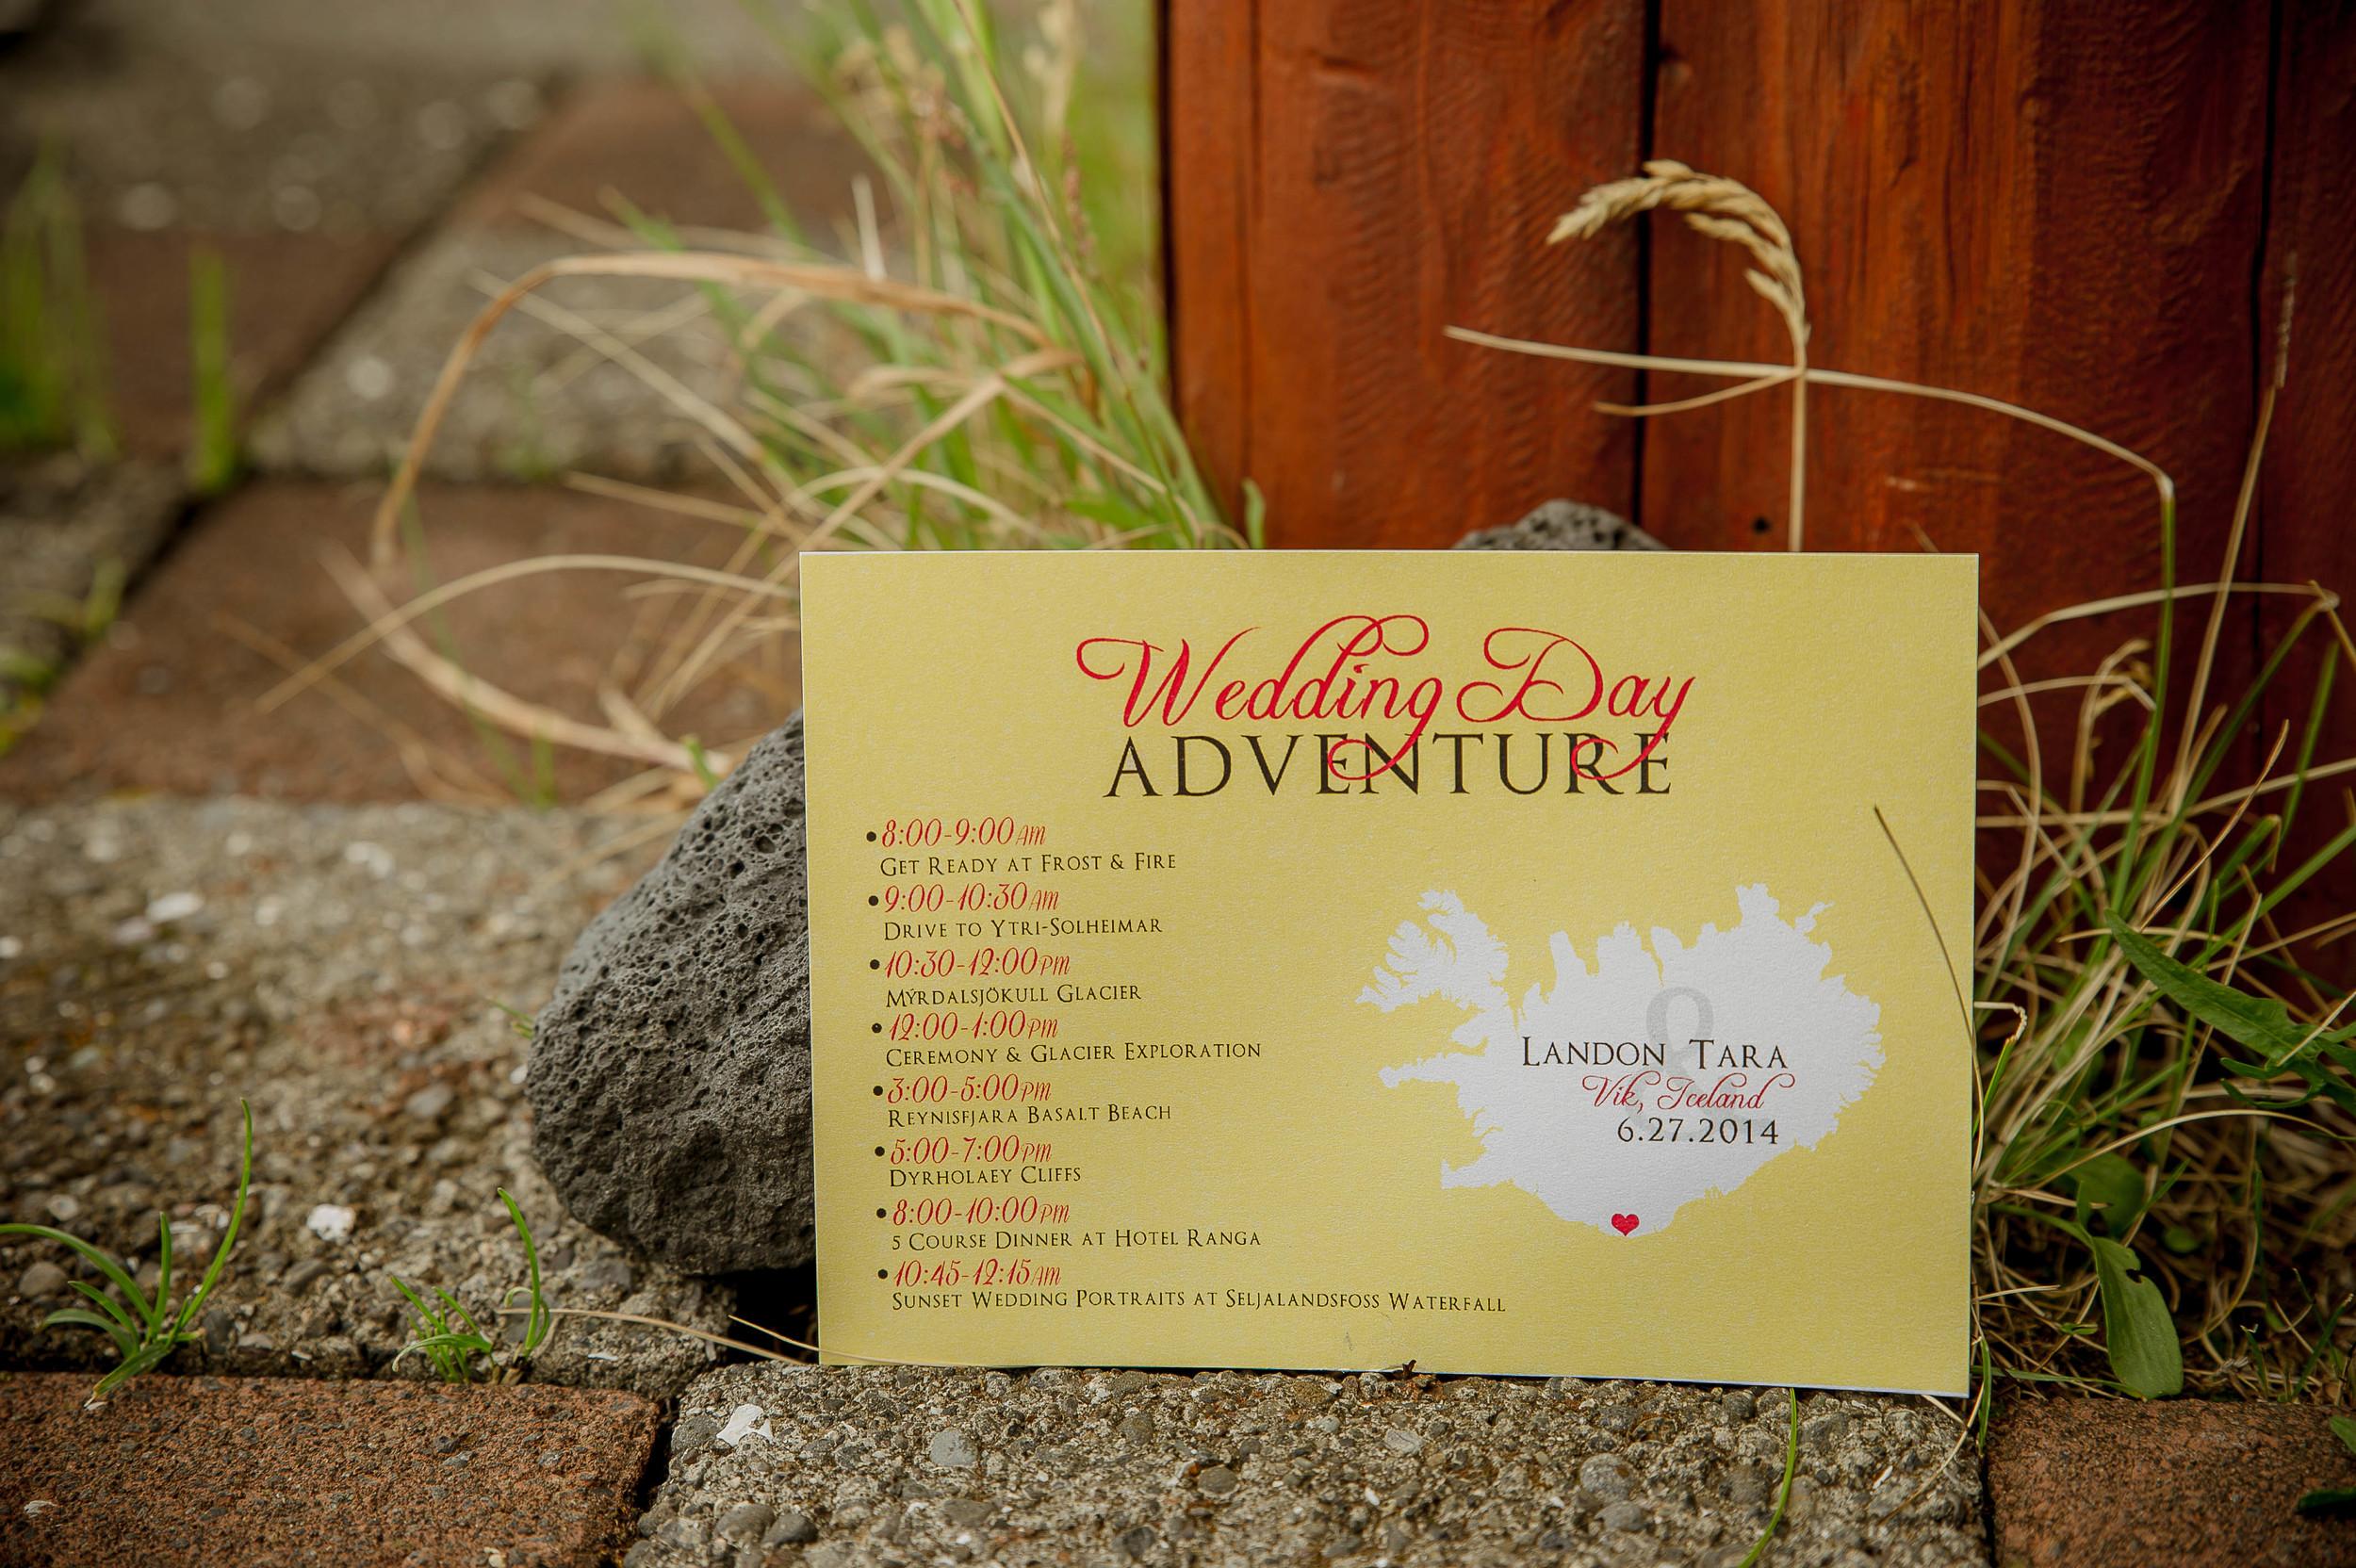 Iceland Adventure Wedding Photos by Miss Ann 1.jpg